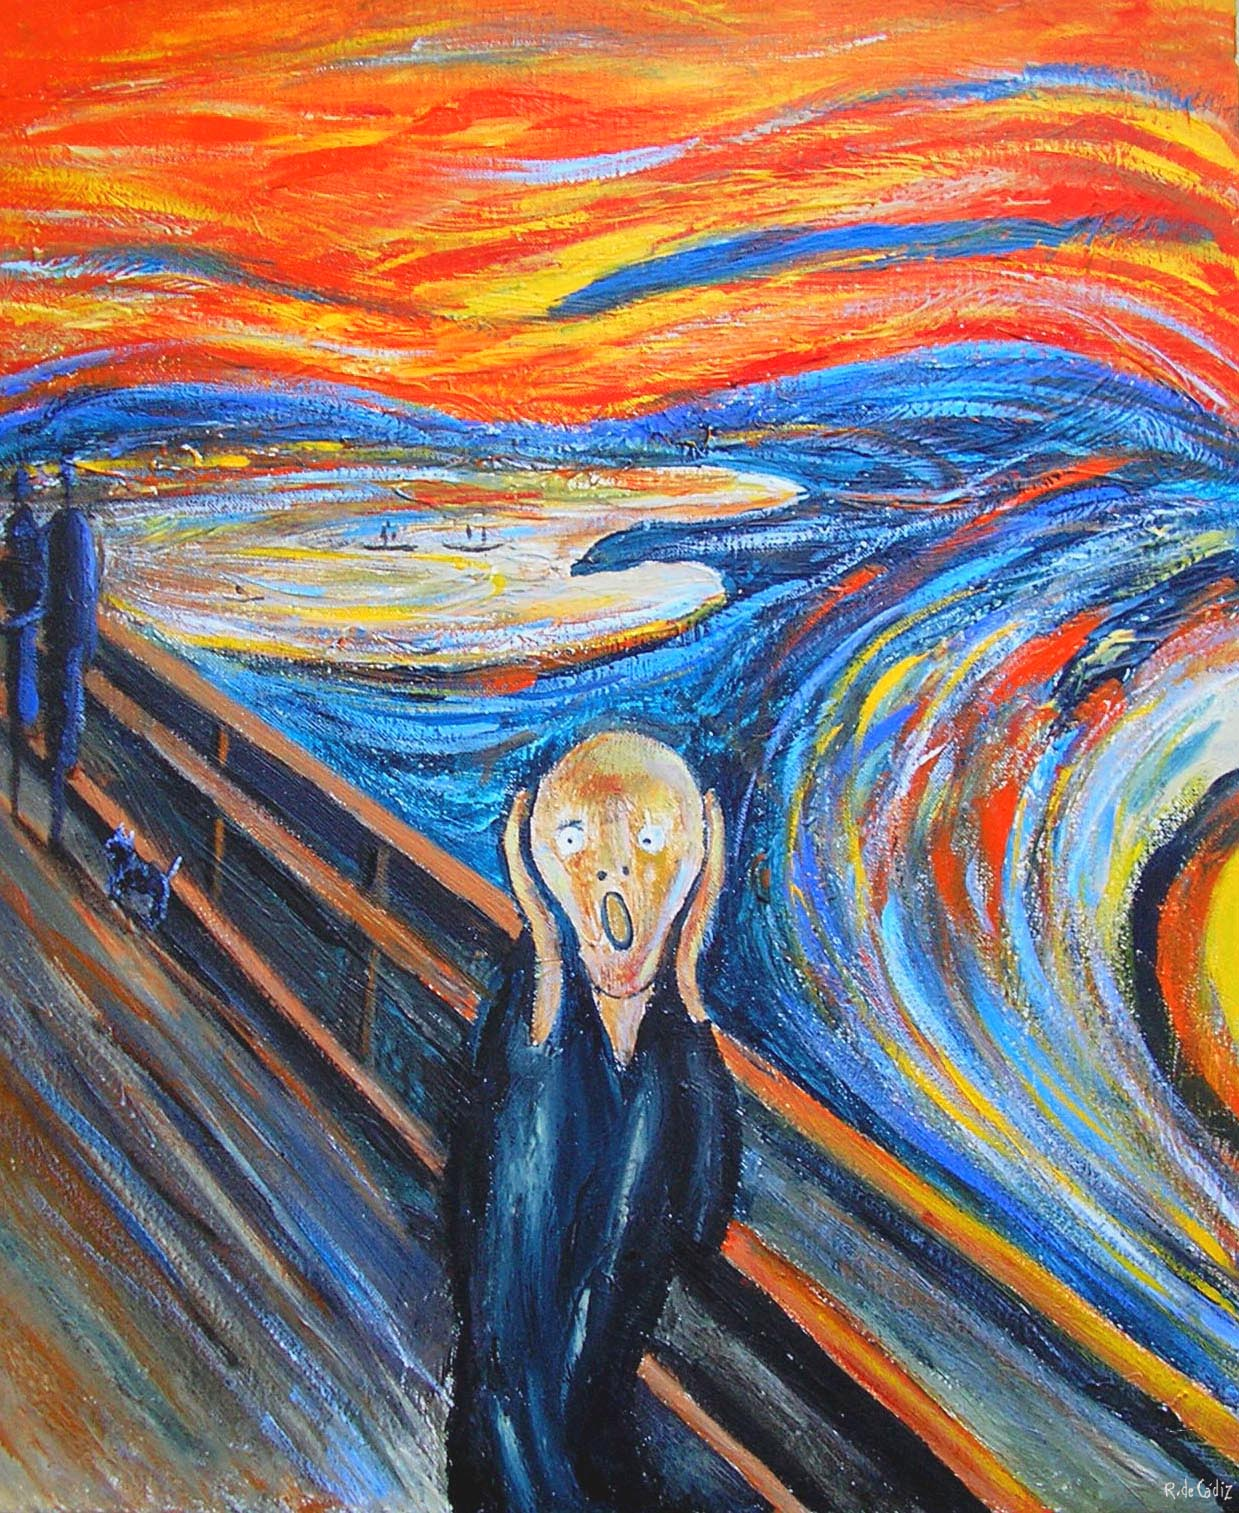 Expresionismo pictórico